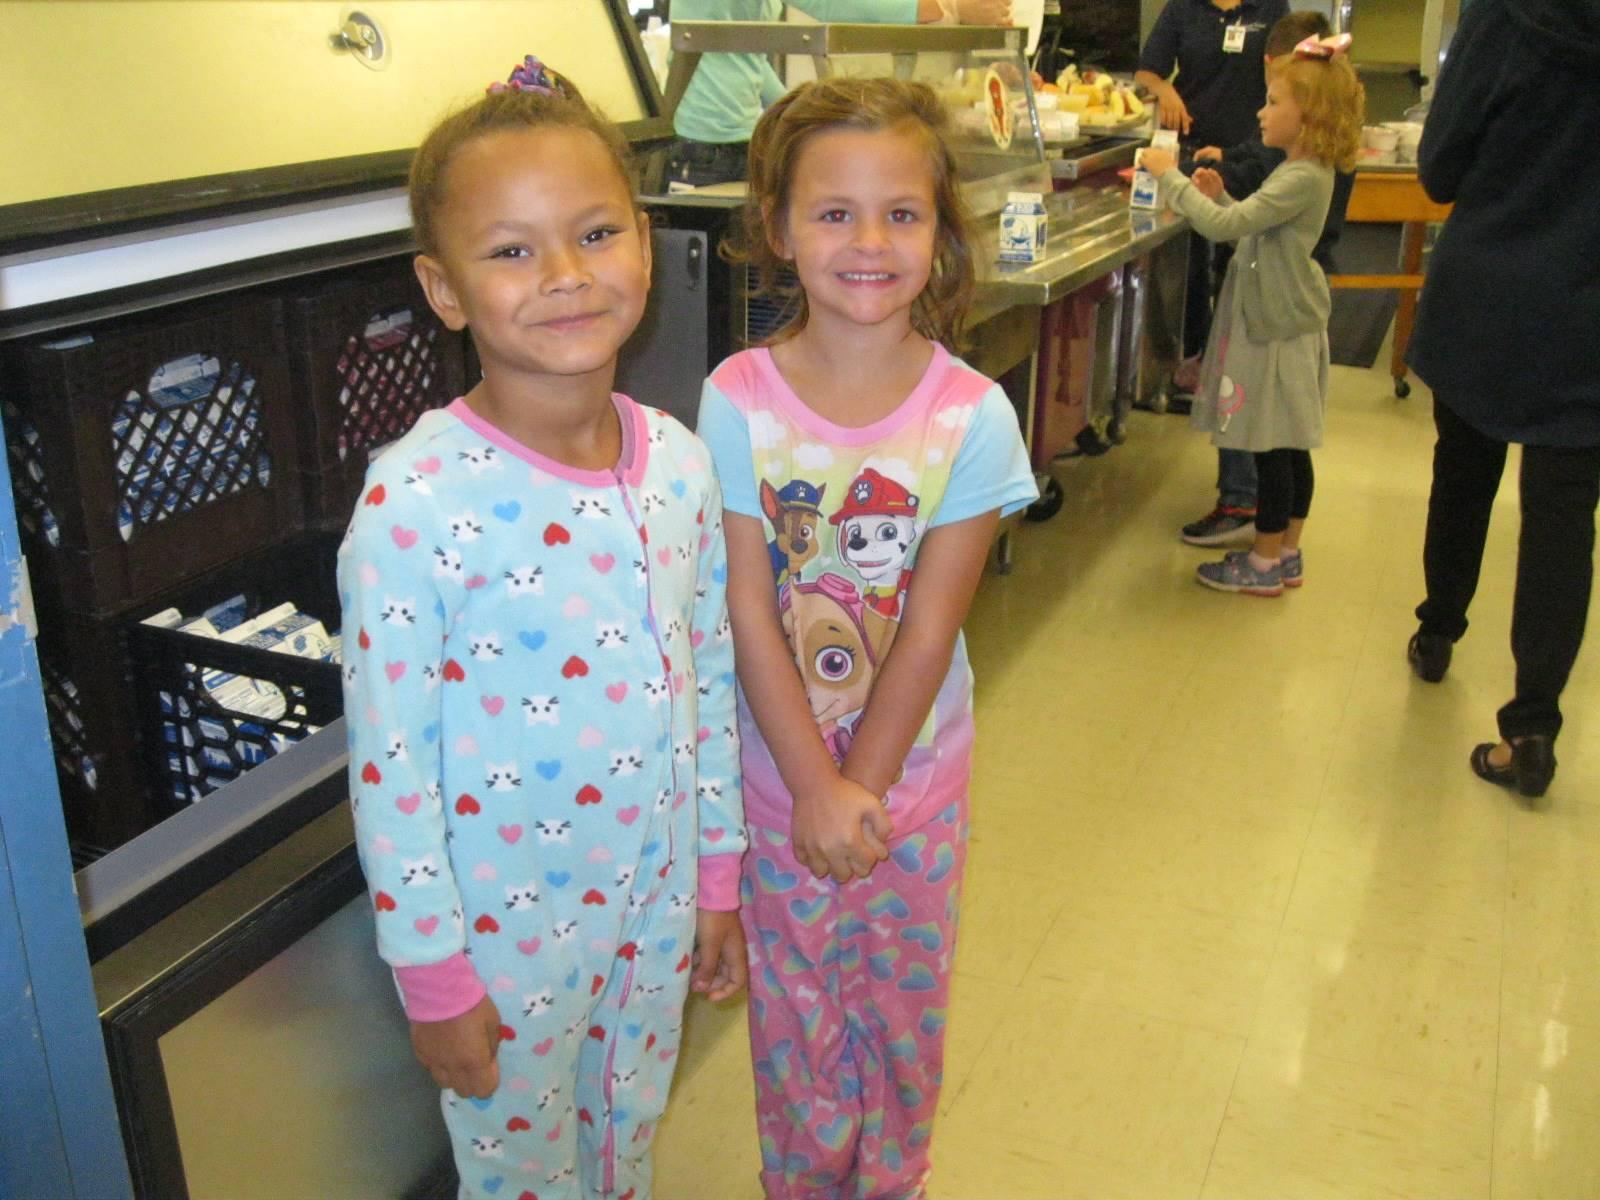 2 students in Pjs.